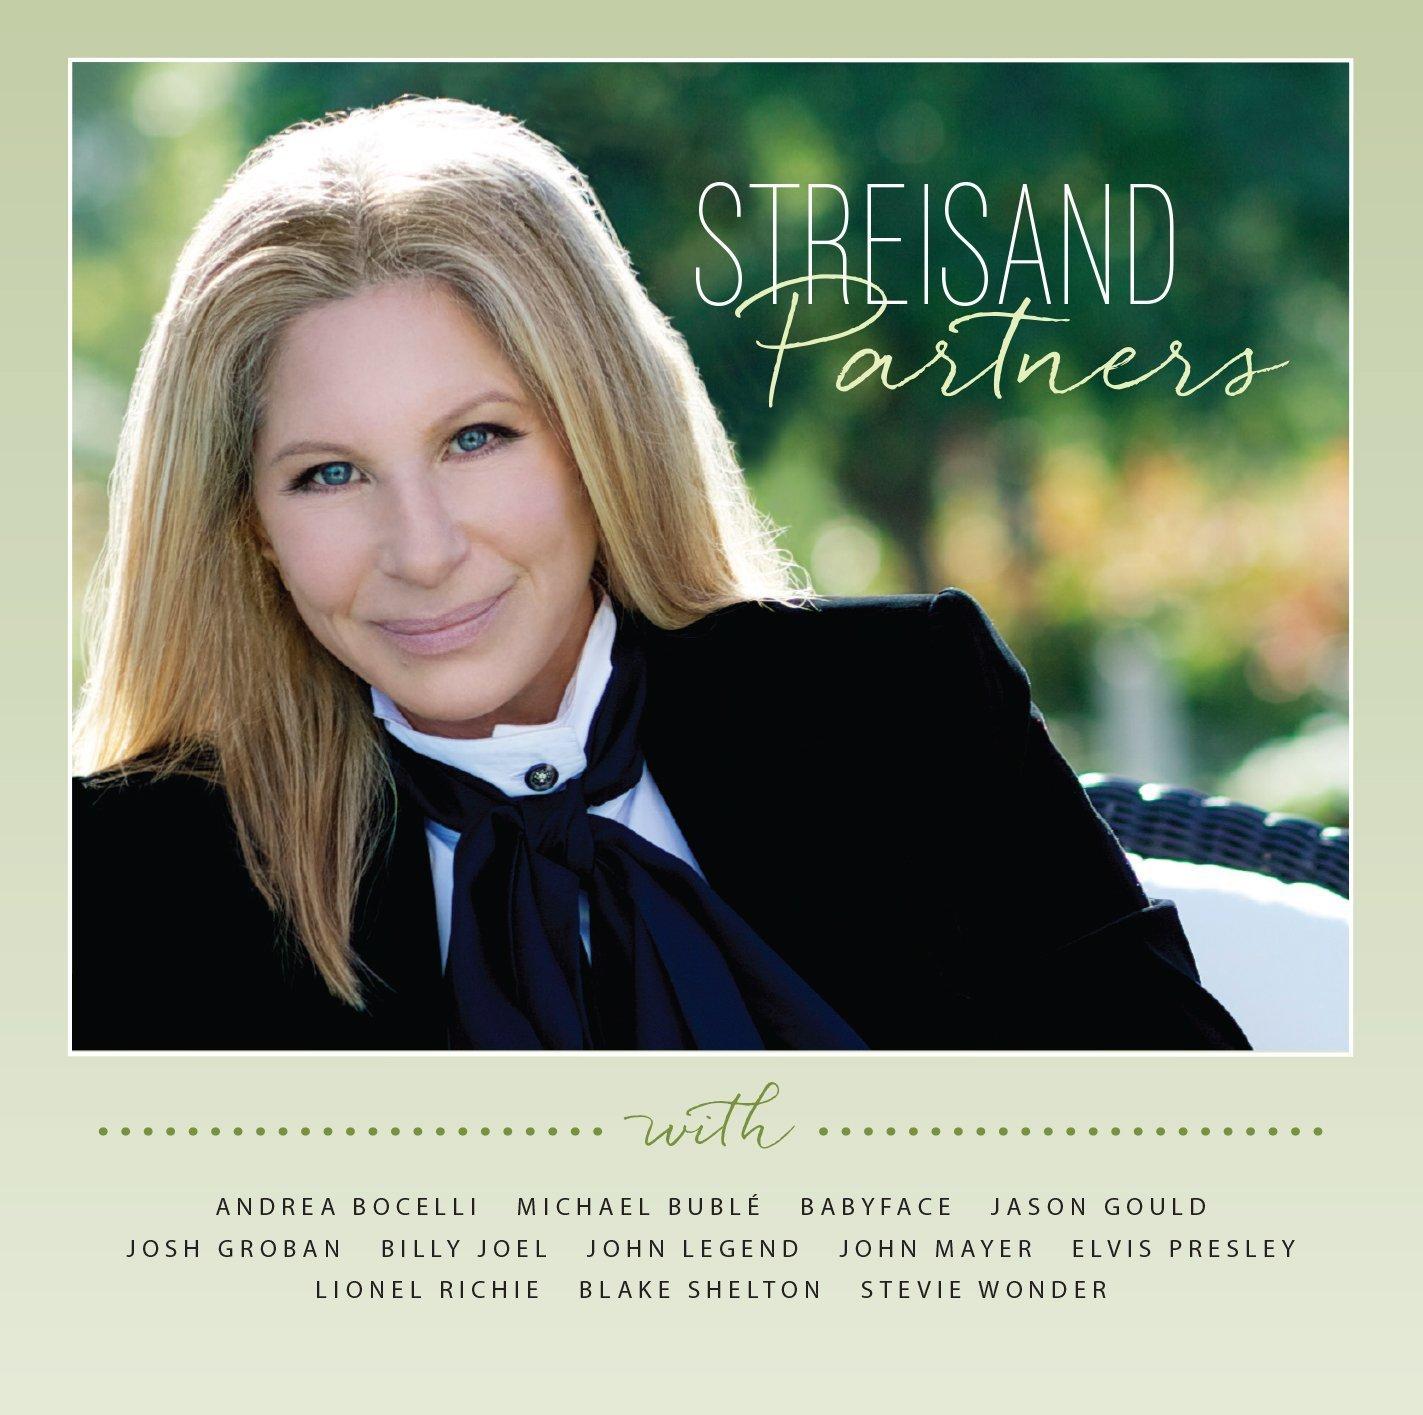 Partners by Barbra Streisand image